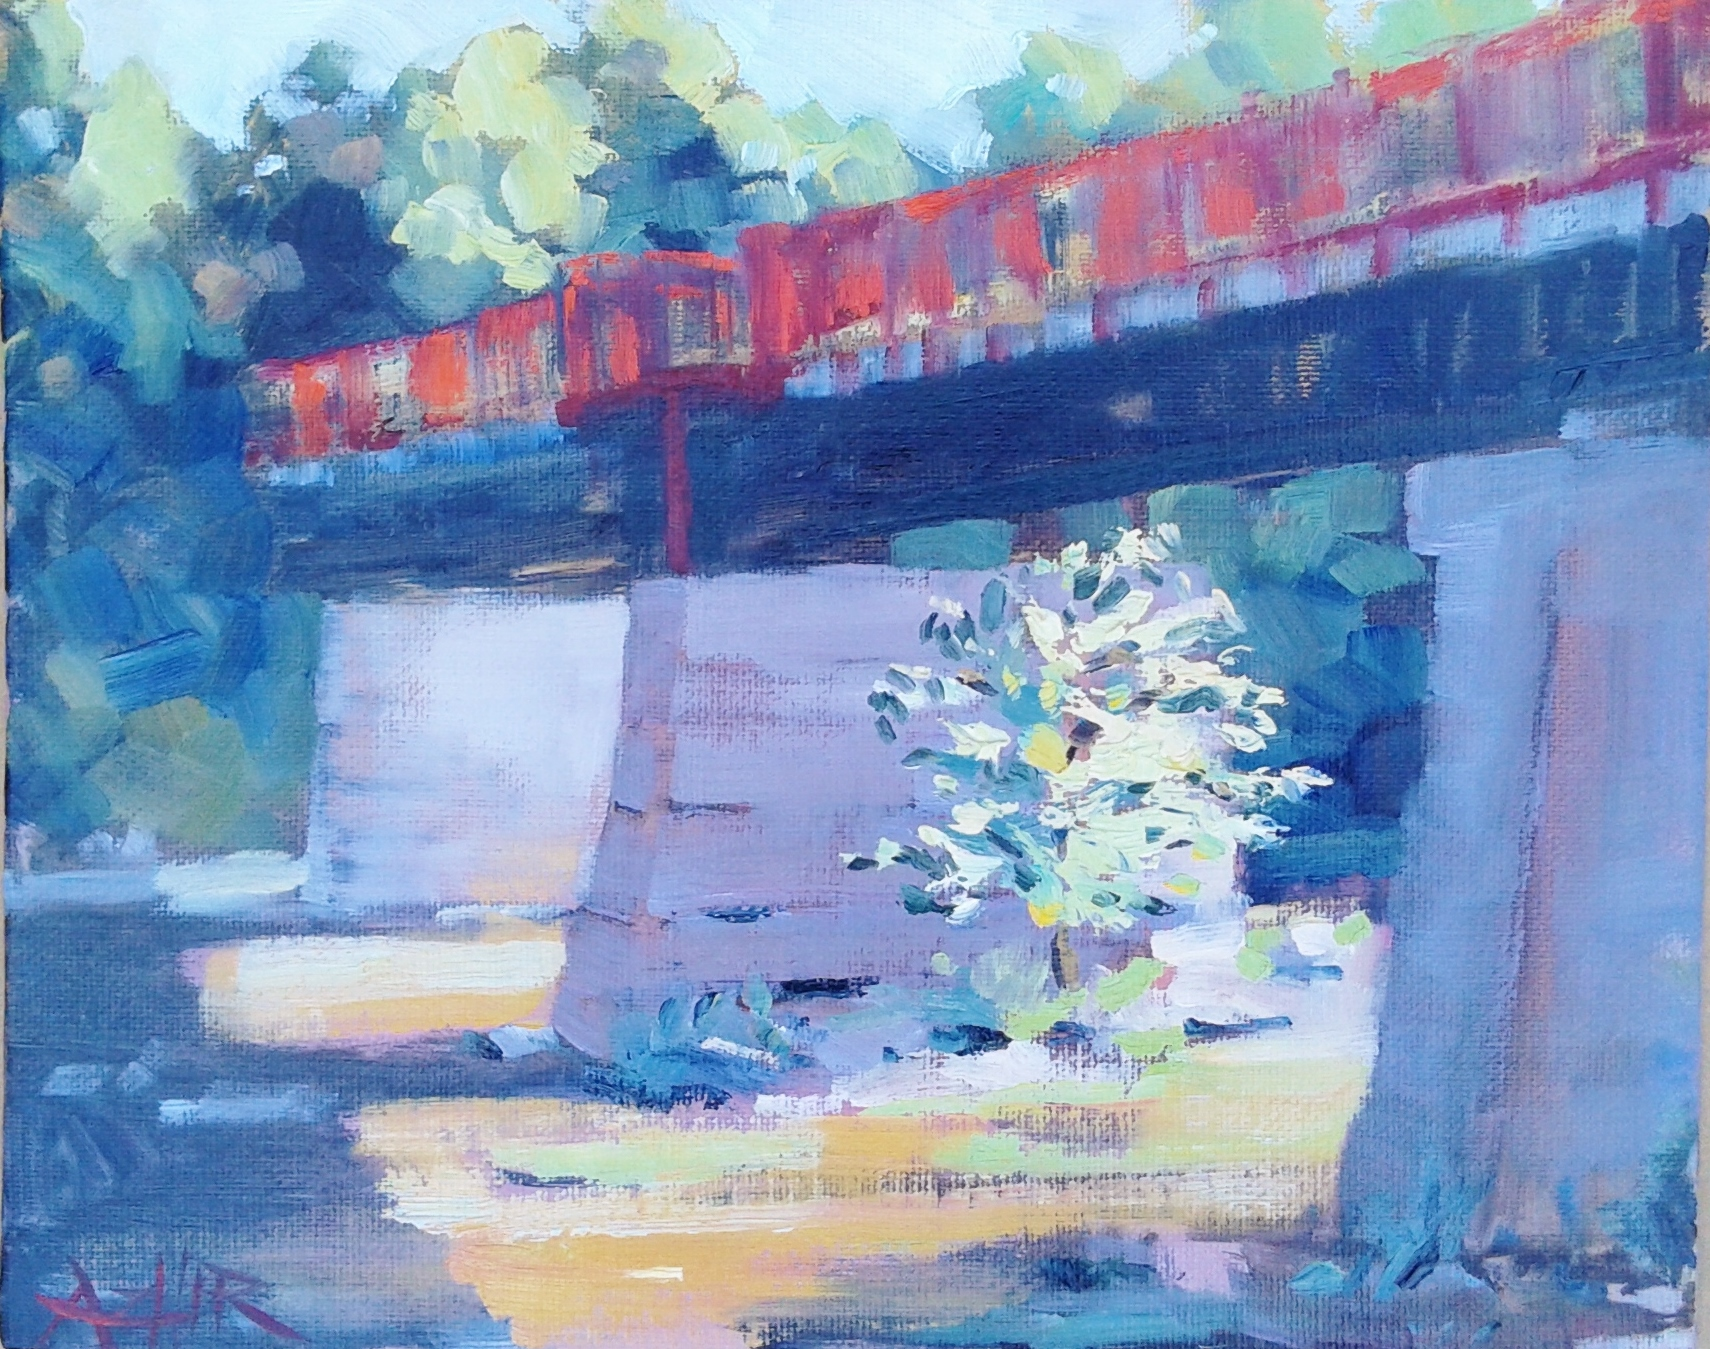 "SOLD, The Monon Bridge in Broad Ripple, Copyright 2016 Hirschten, Oil on Canvas, 8"" x 10"""